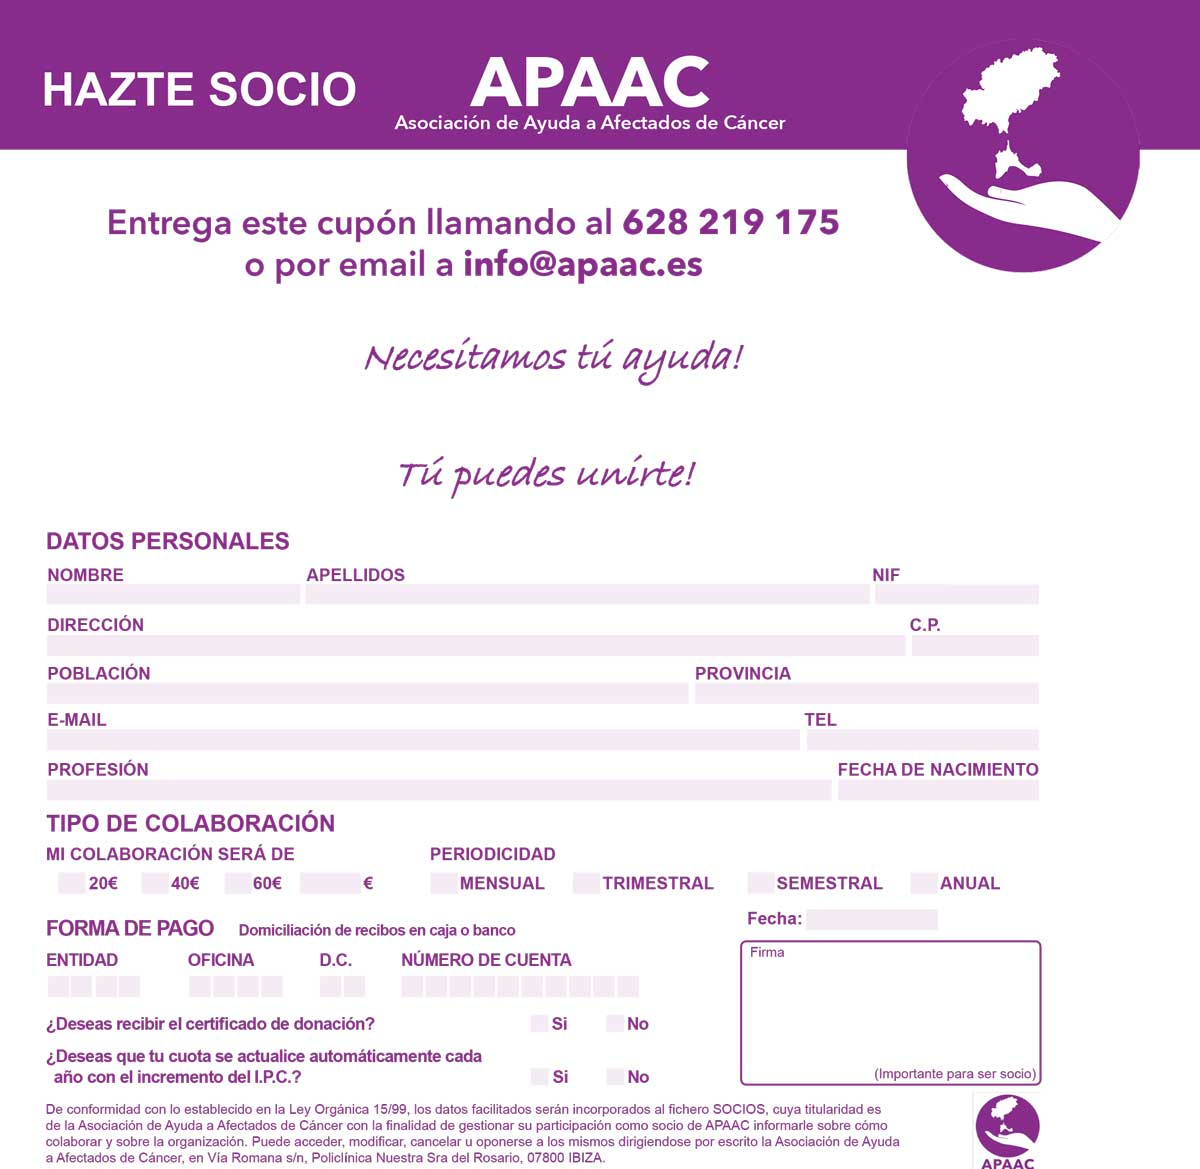 HAZTE-SOCIO-APAAC-1